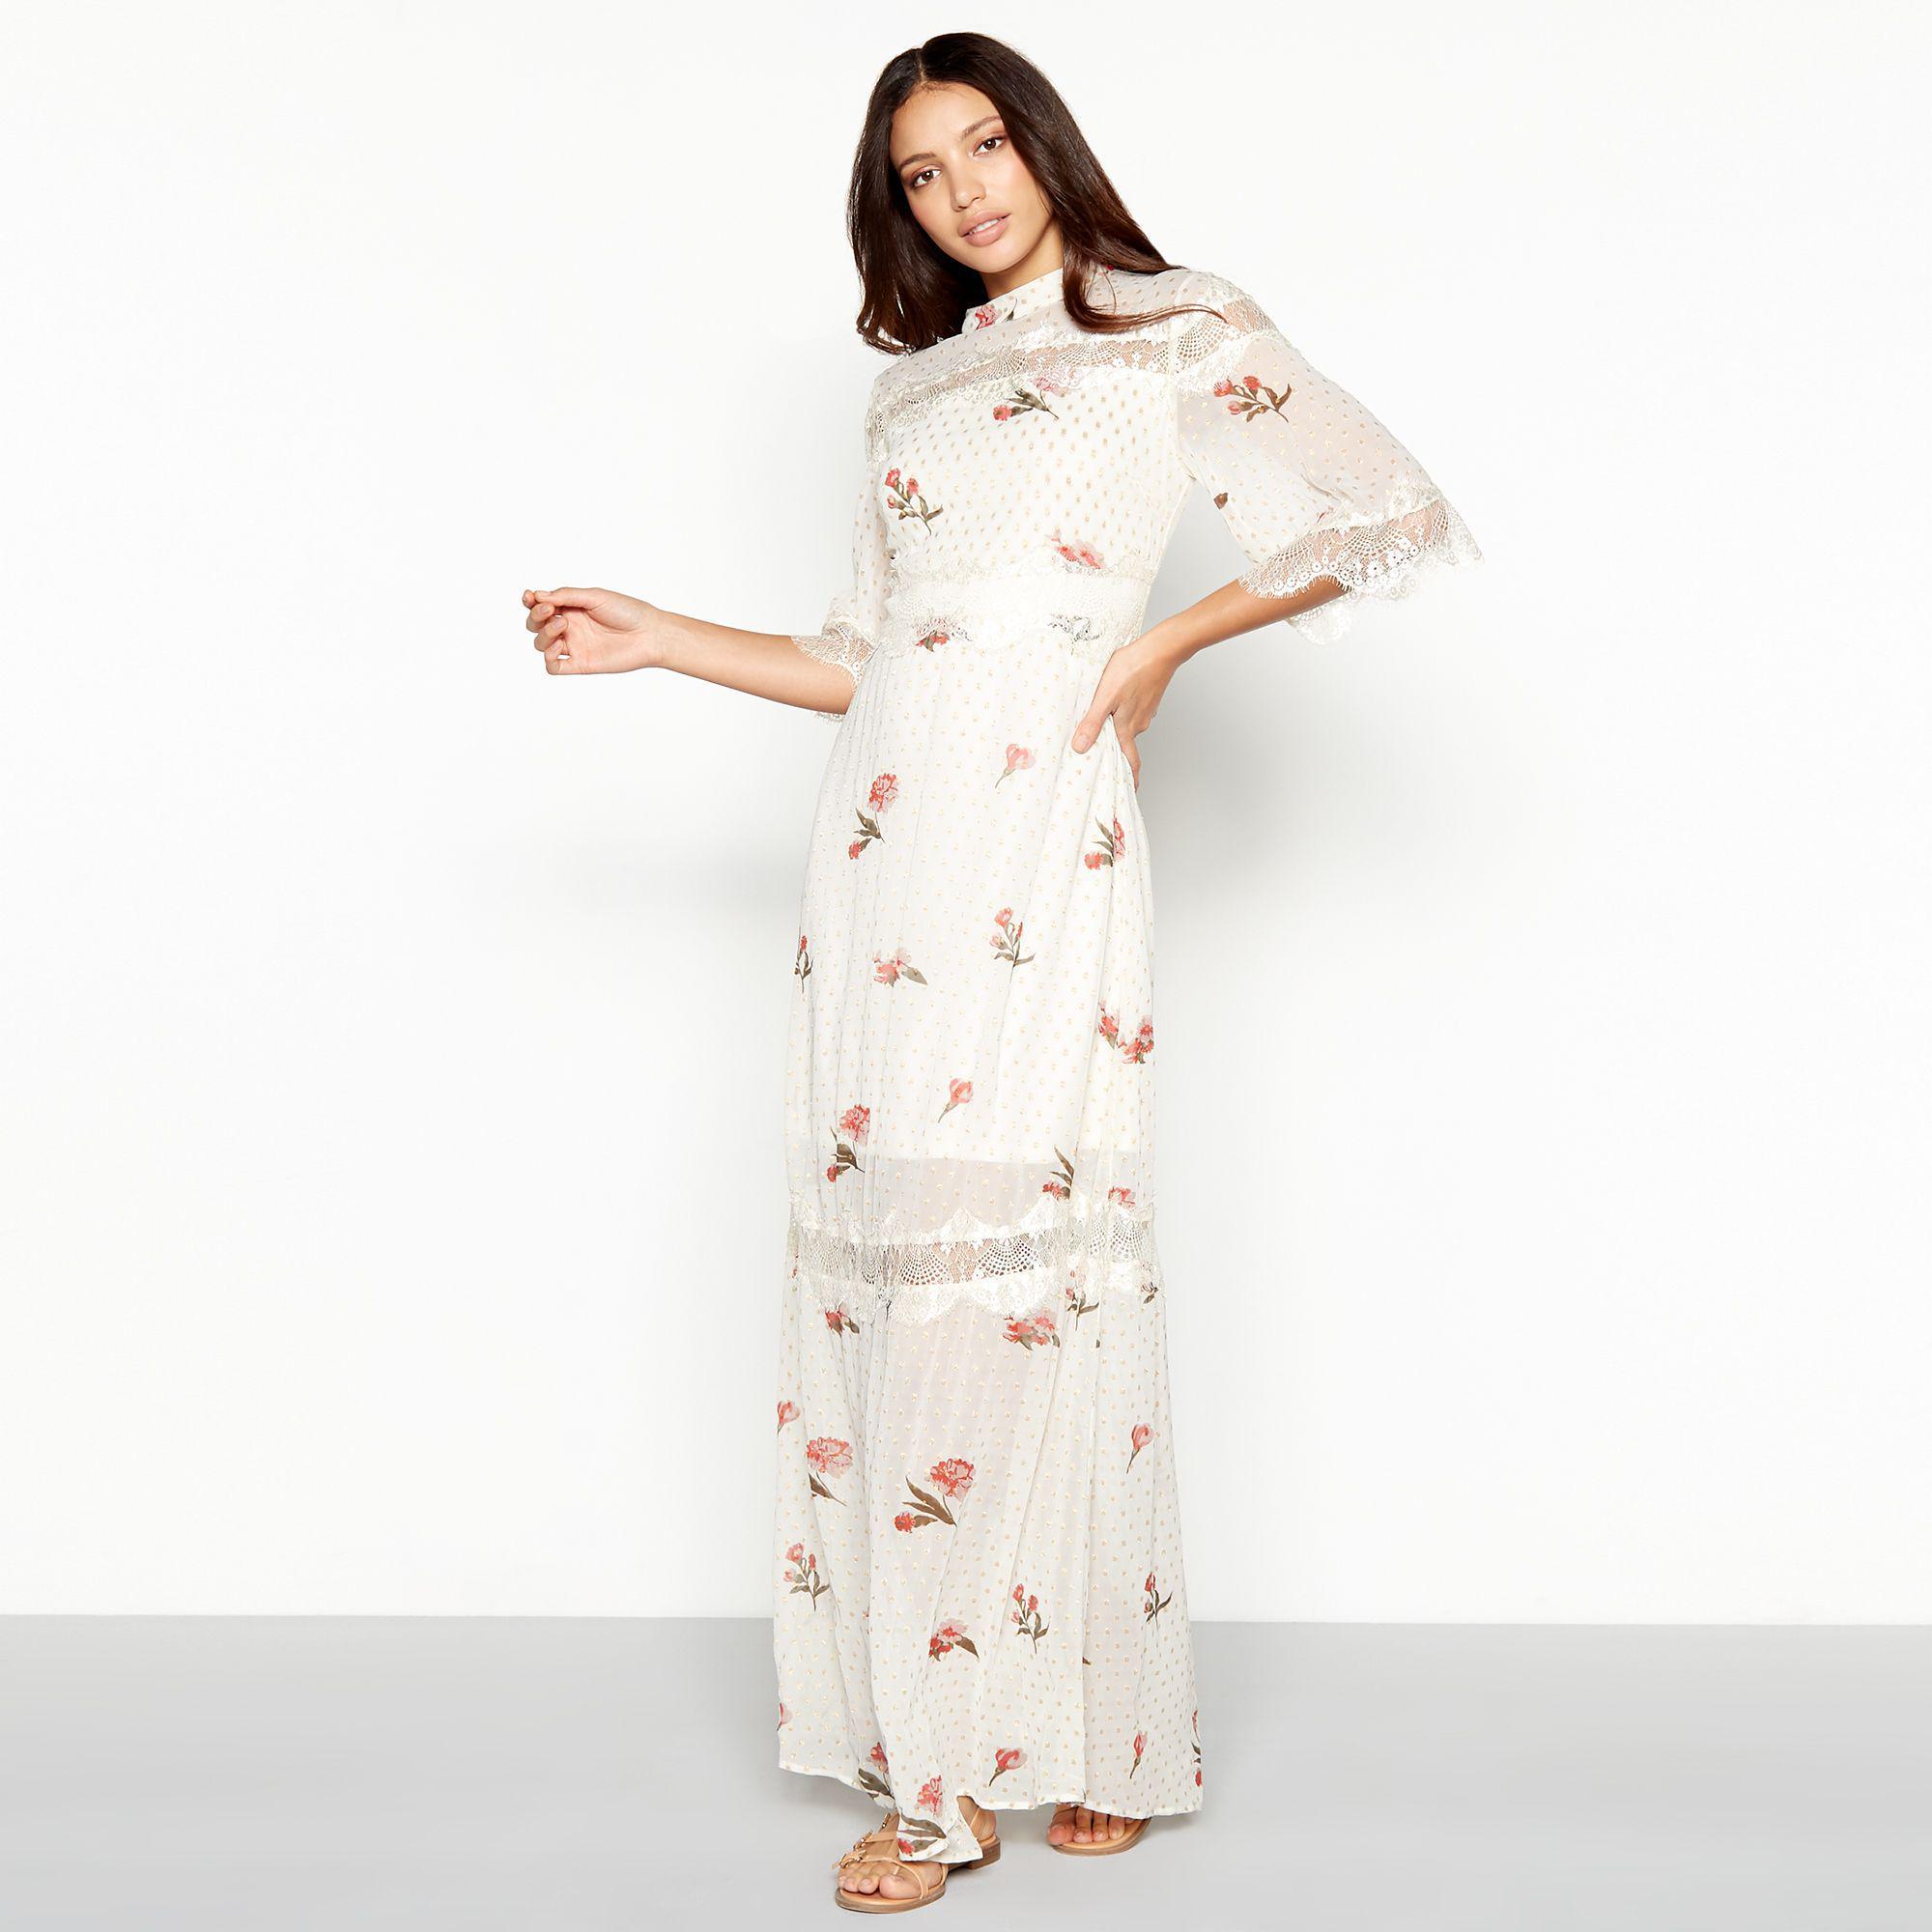 b1538dc25e3 Lace Chiffon Maxi Dress White